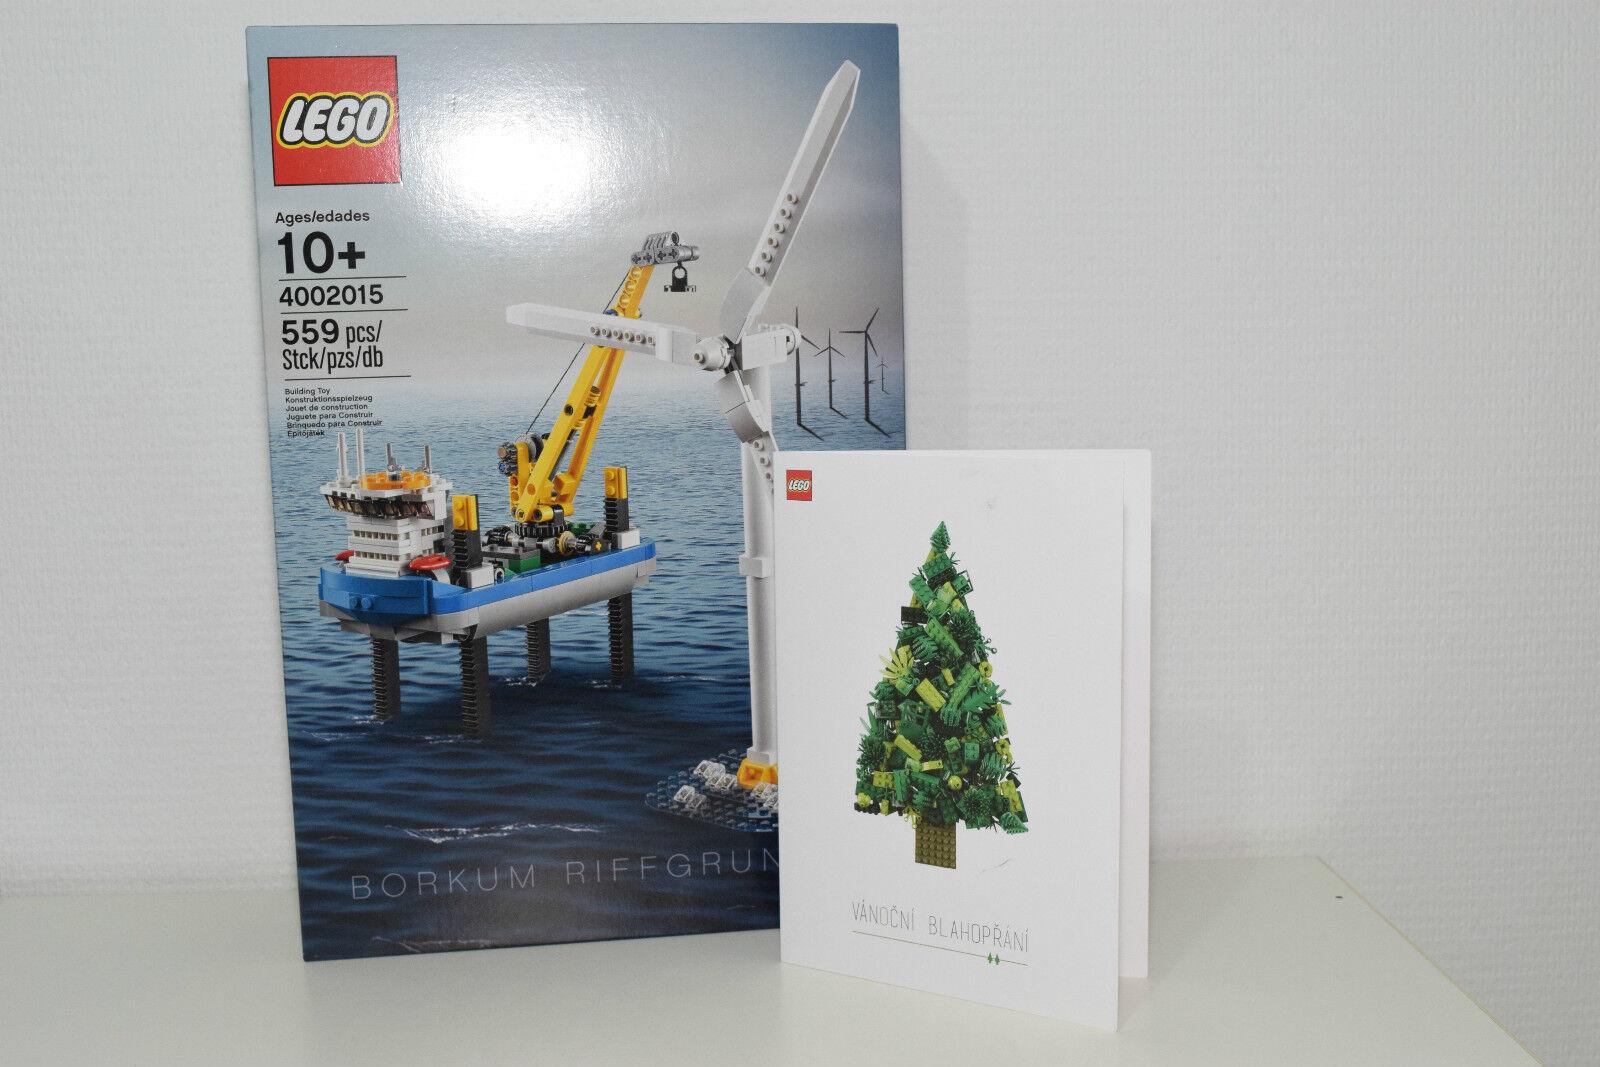 LEGO 4002015 BORKUM RIFFGRUND 1 MISB NEW SEALED WITH CHRISTMAS CARD RARE SELTEN